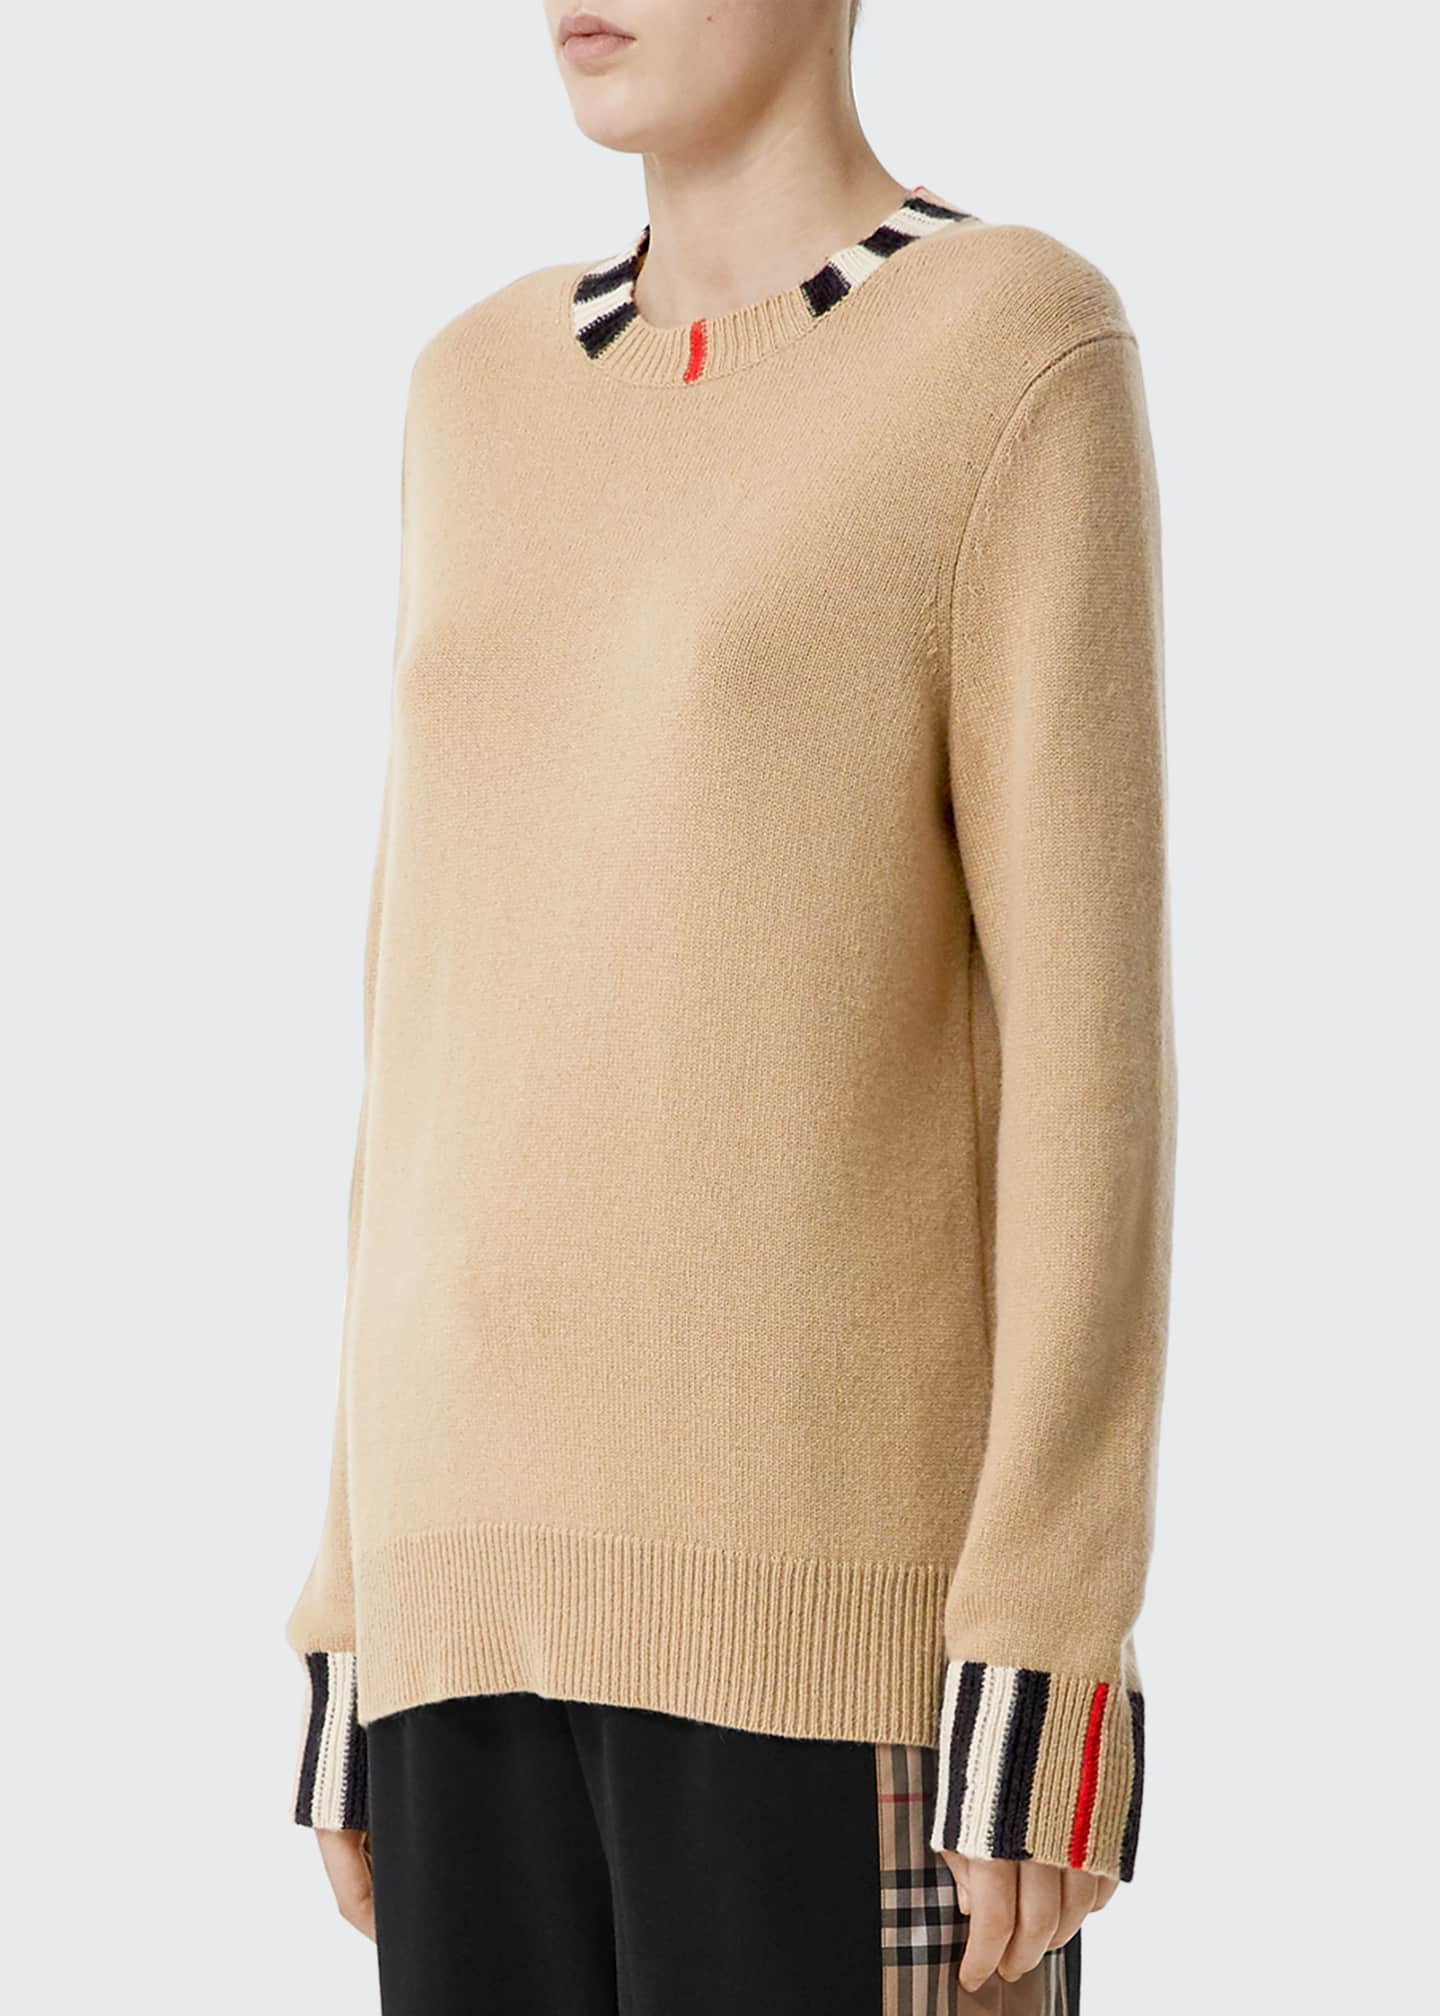 Burberry Cashmere Check-Trim Sweater, Beige